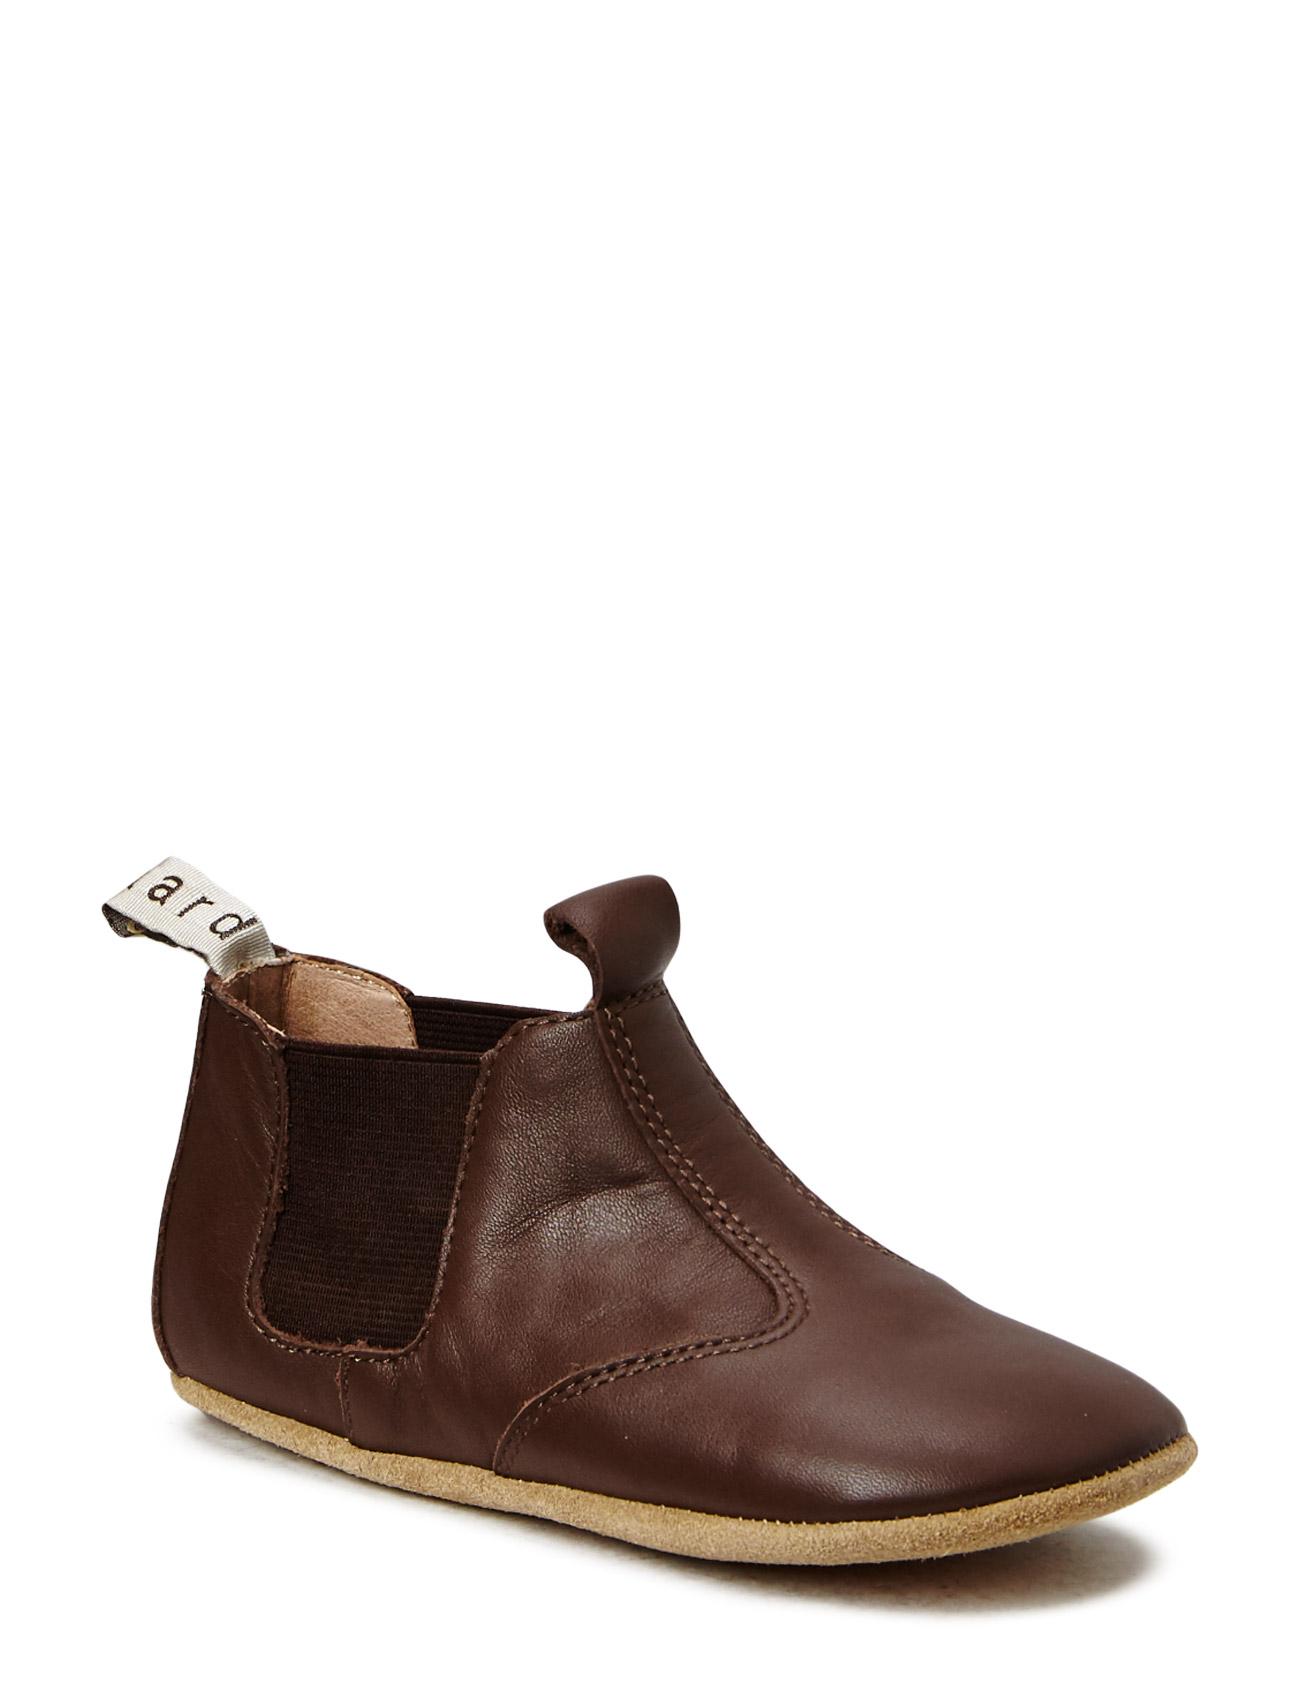 1cb76f41a09 Chelsea Home Shoe Slippers Hjemmesko Brun BISGAARD